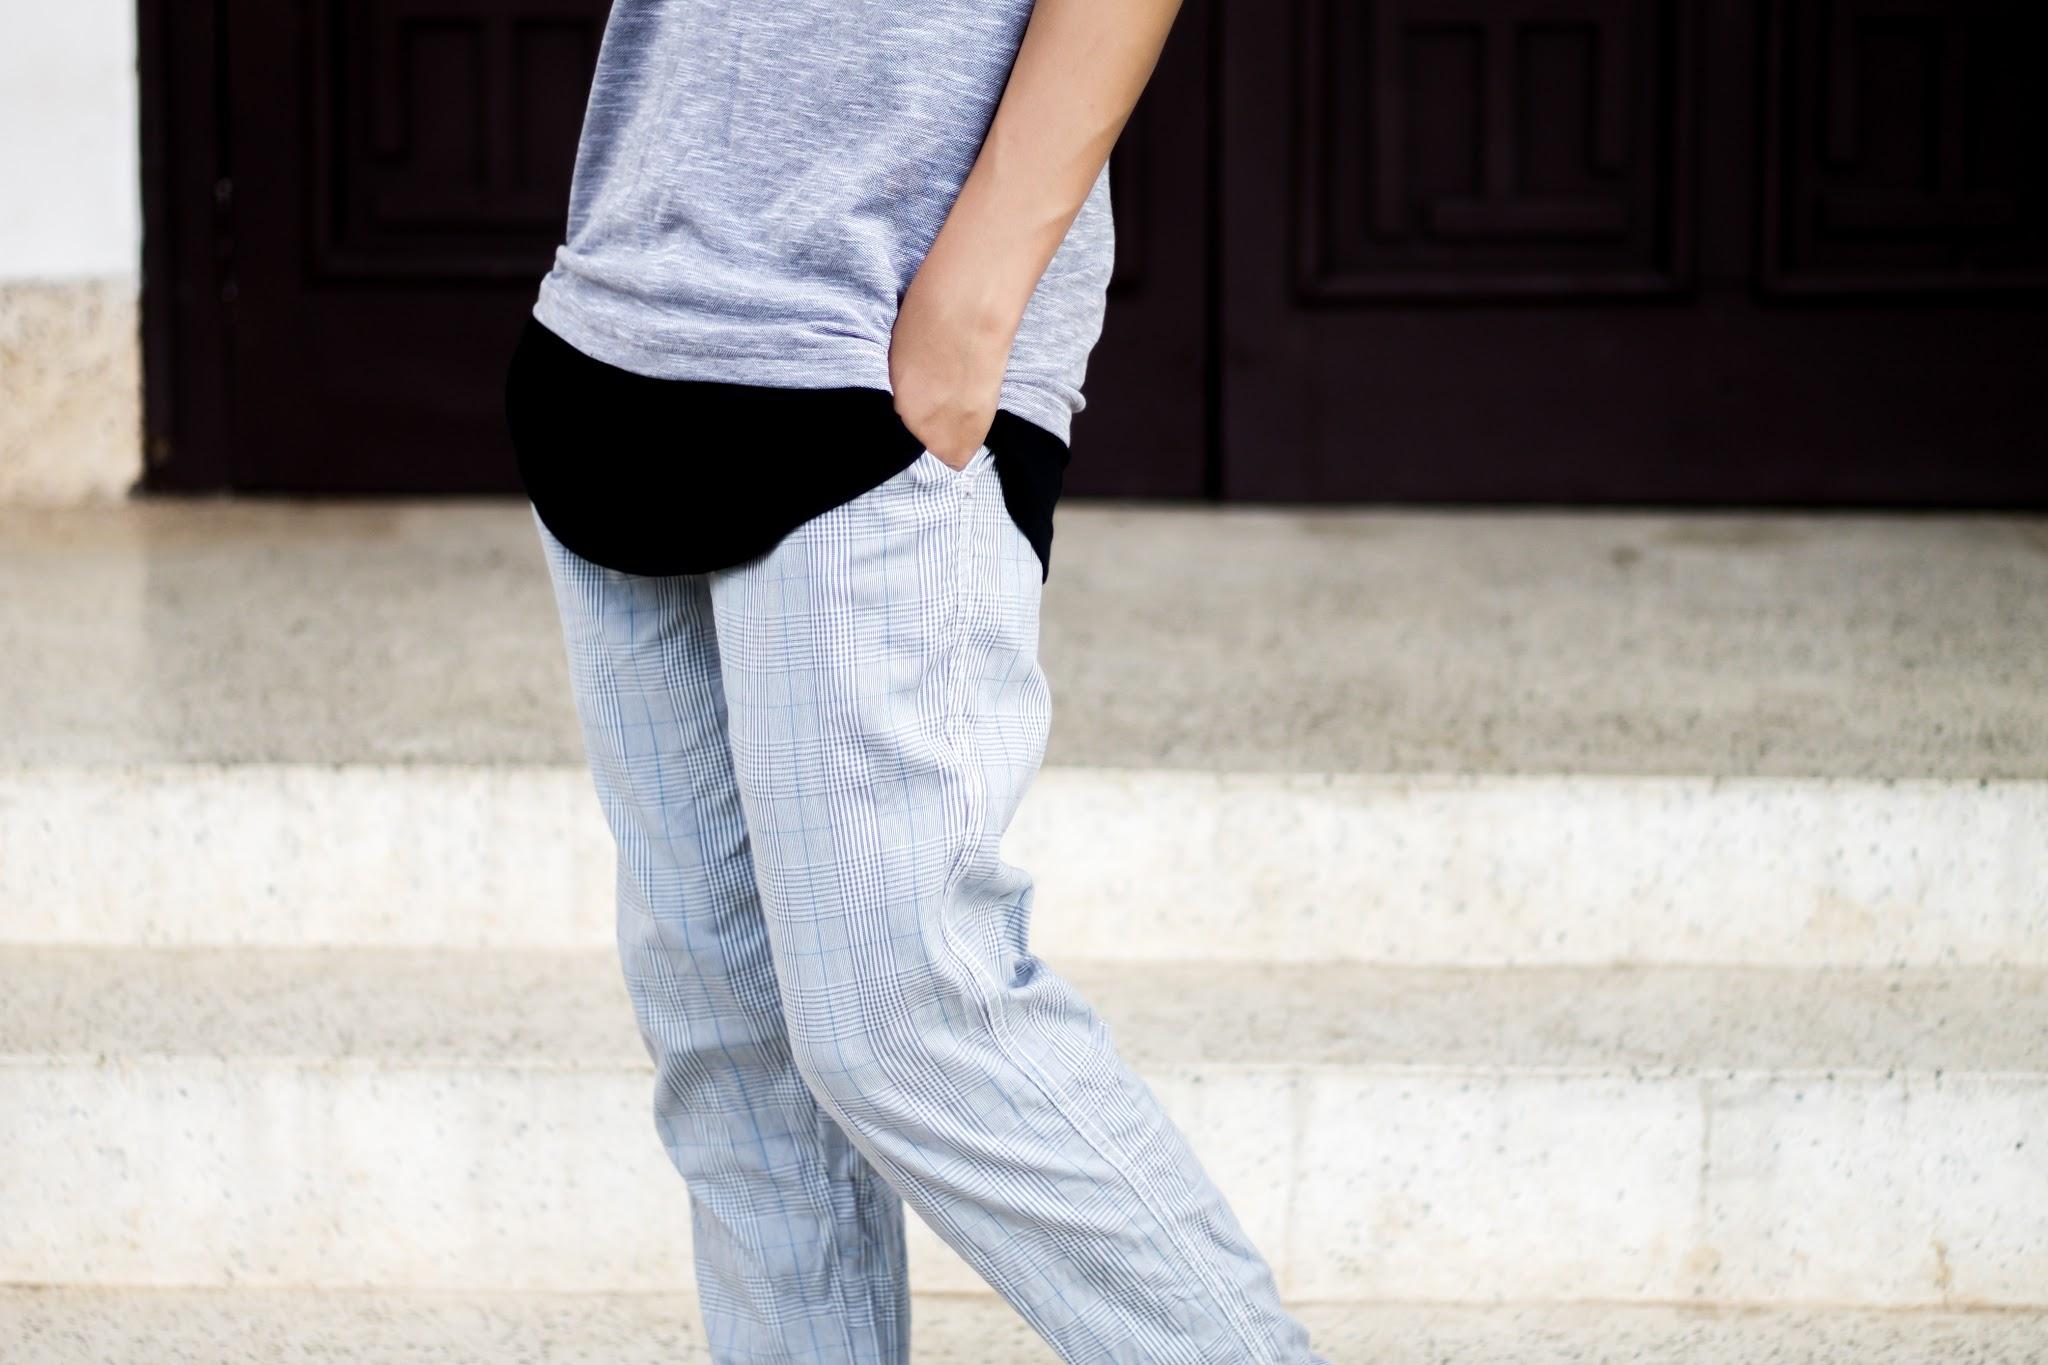 MaxFashion T-shirt, Mr Button for Koovs trouser, Koovs Jacket & boots